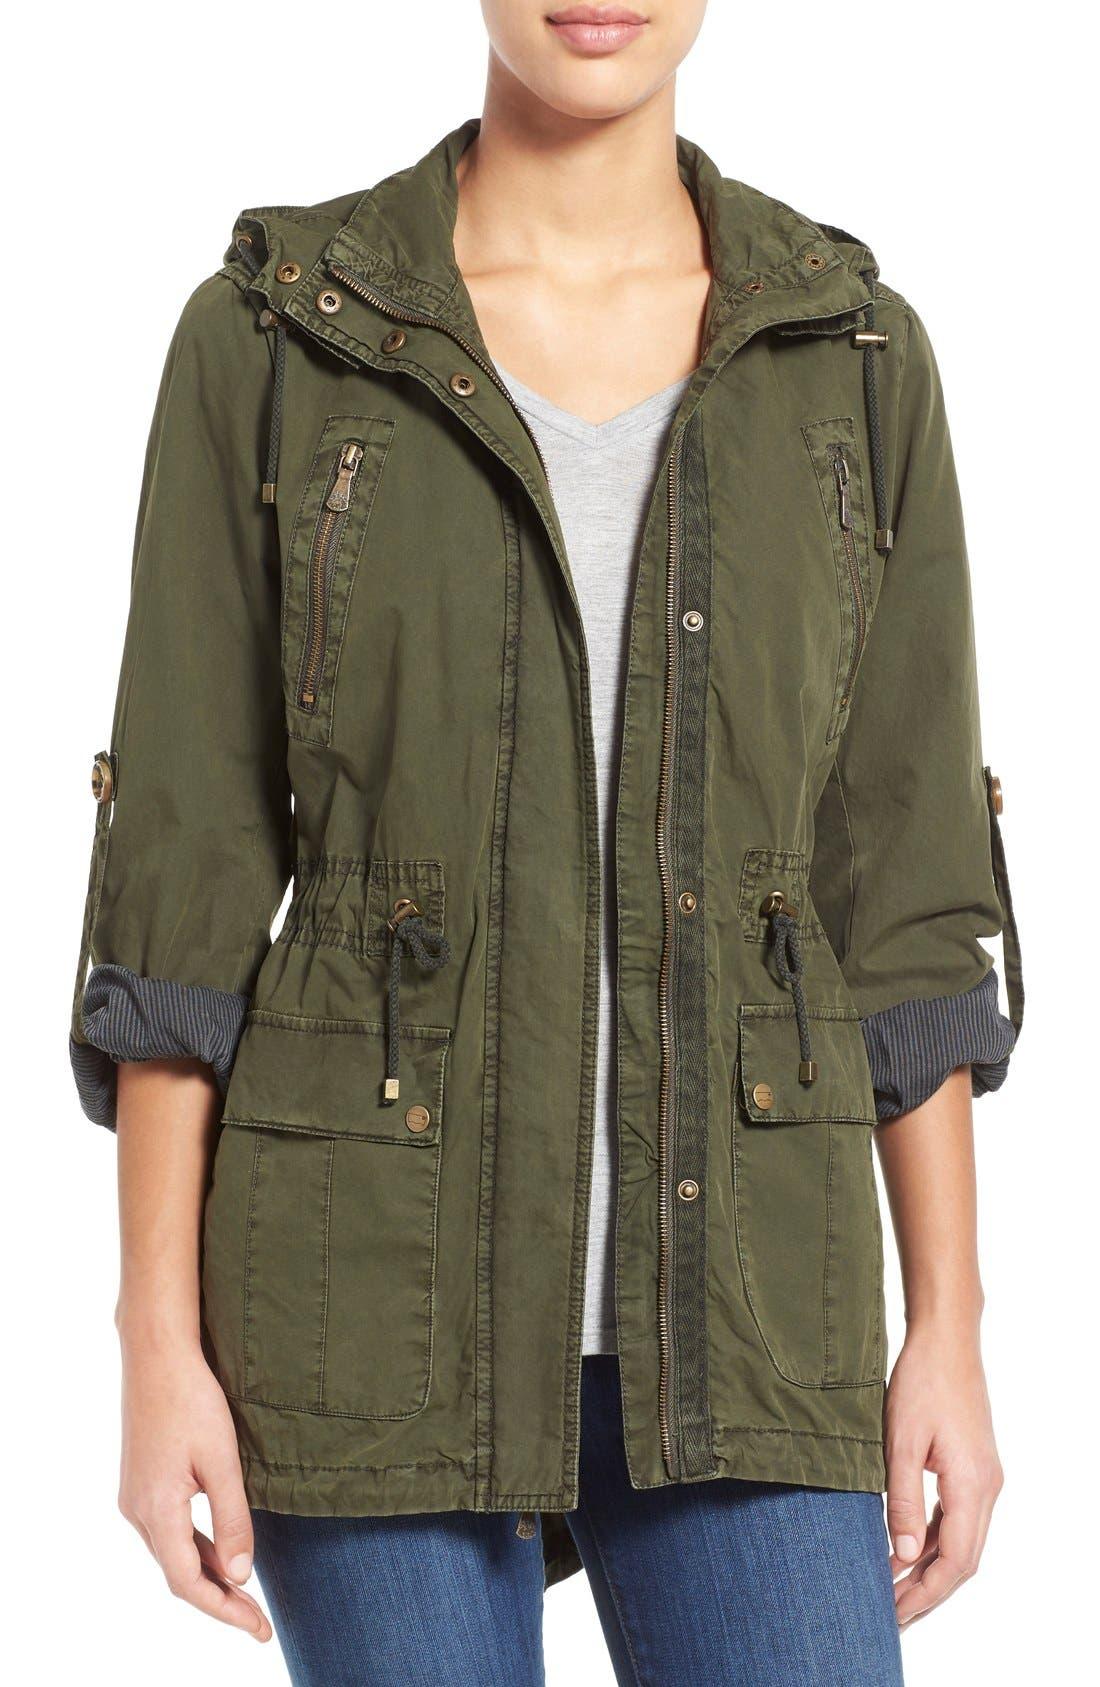 Parachute Hooded Cotton Utility Jacket,                             Main thumbnail 1, color,                             Army Green